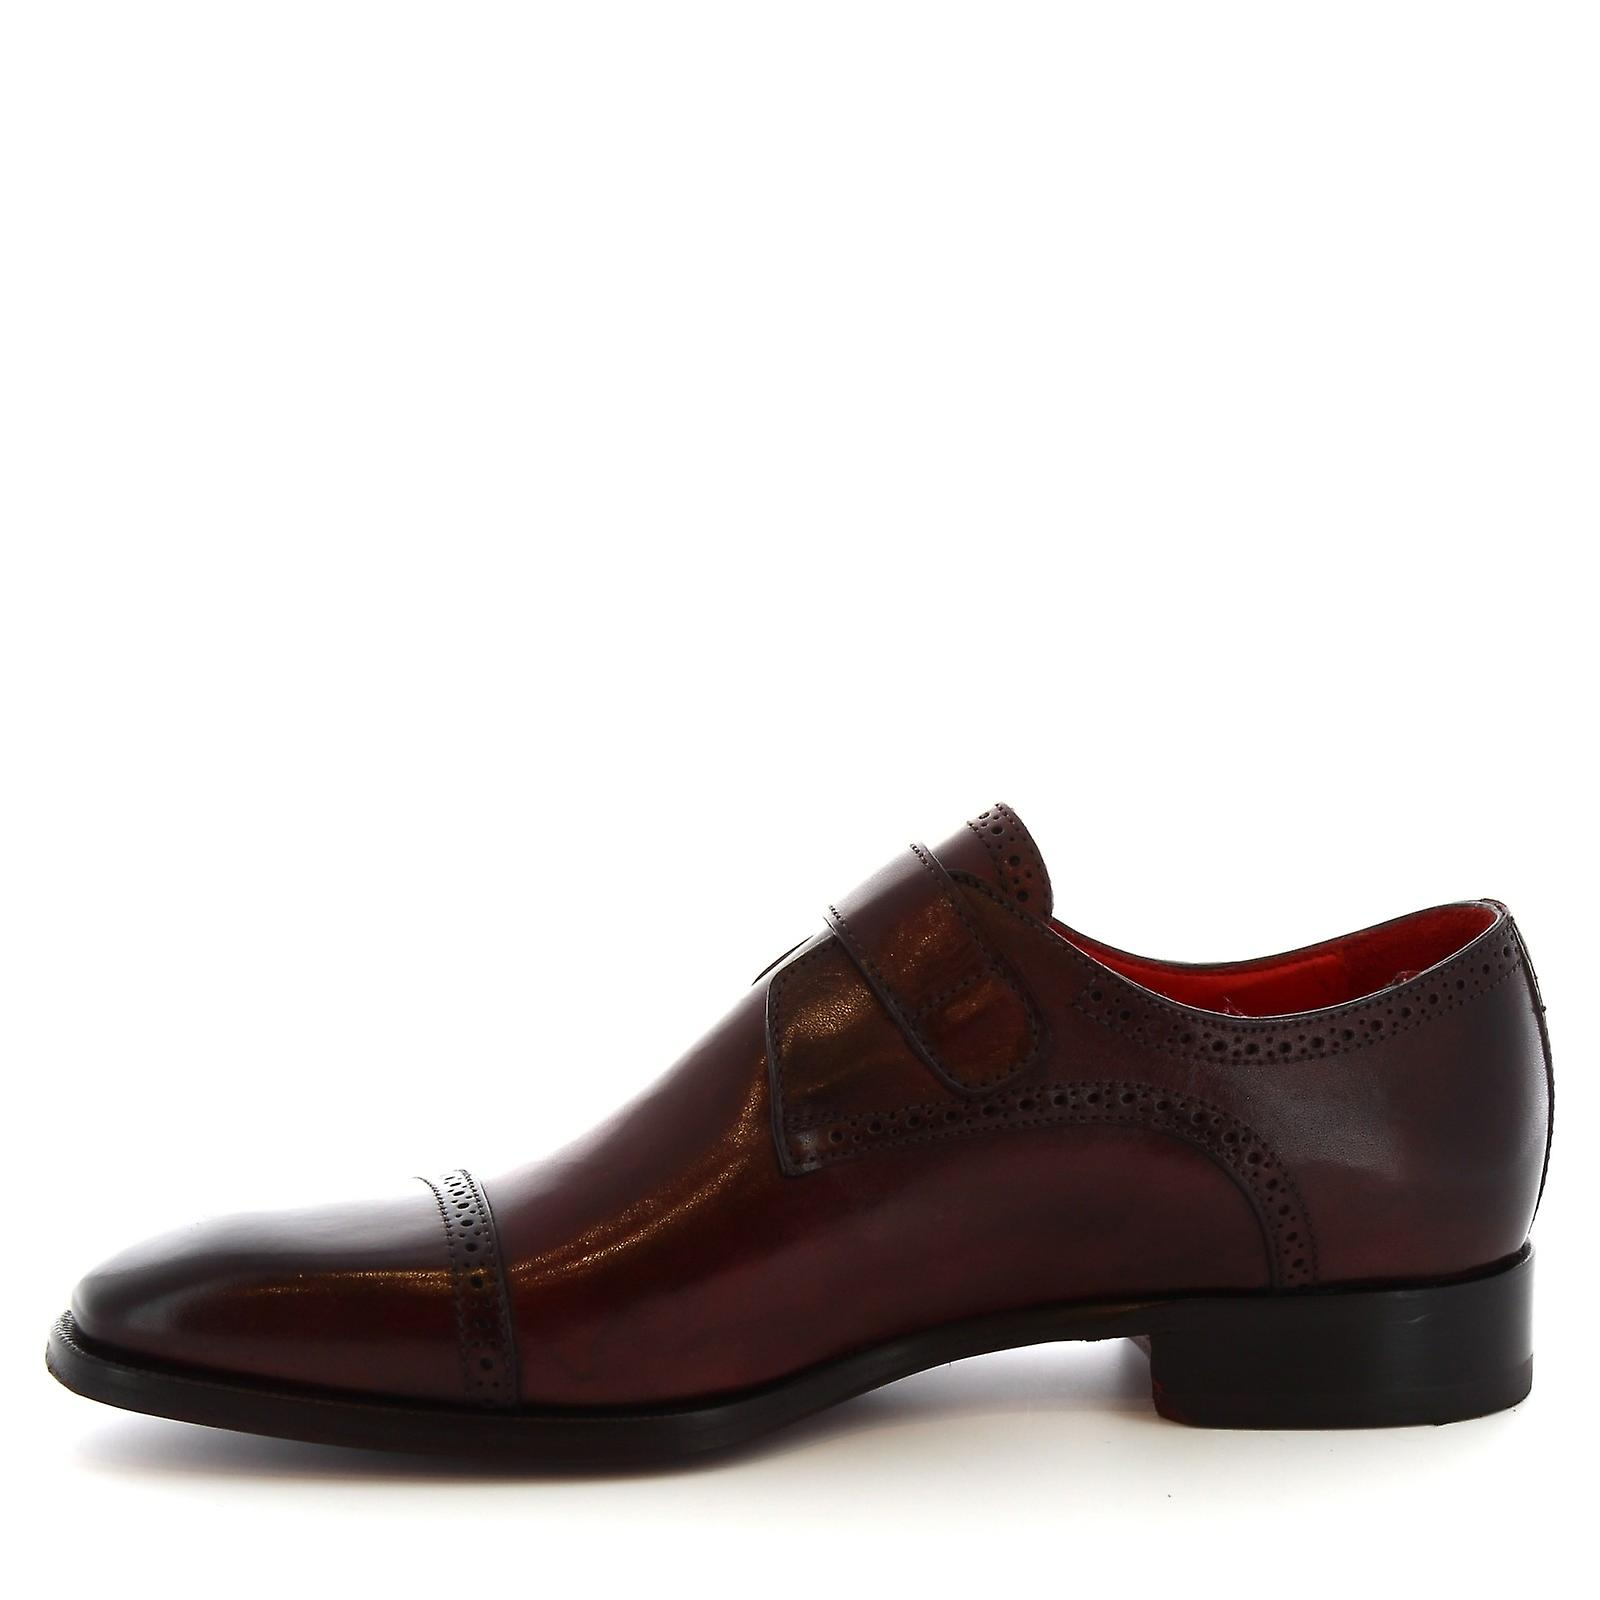 Leonardo Shoes 8737e19tomvitellodelavebordeau Men's Burgundy Leather Monk Strap Shoes uf4gQs